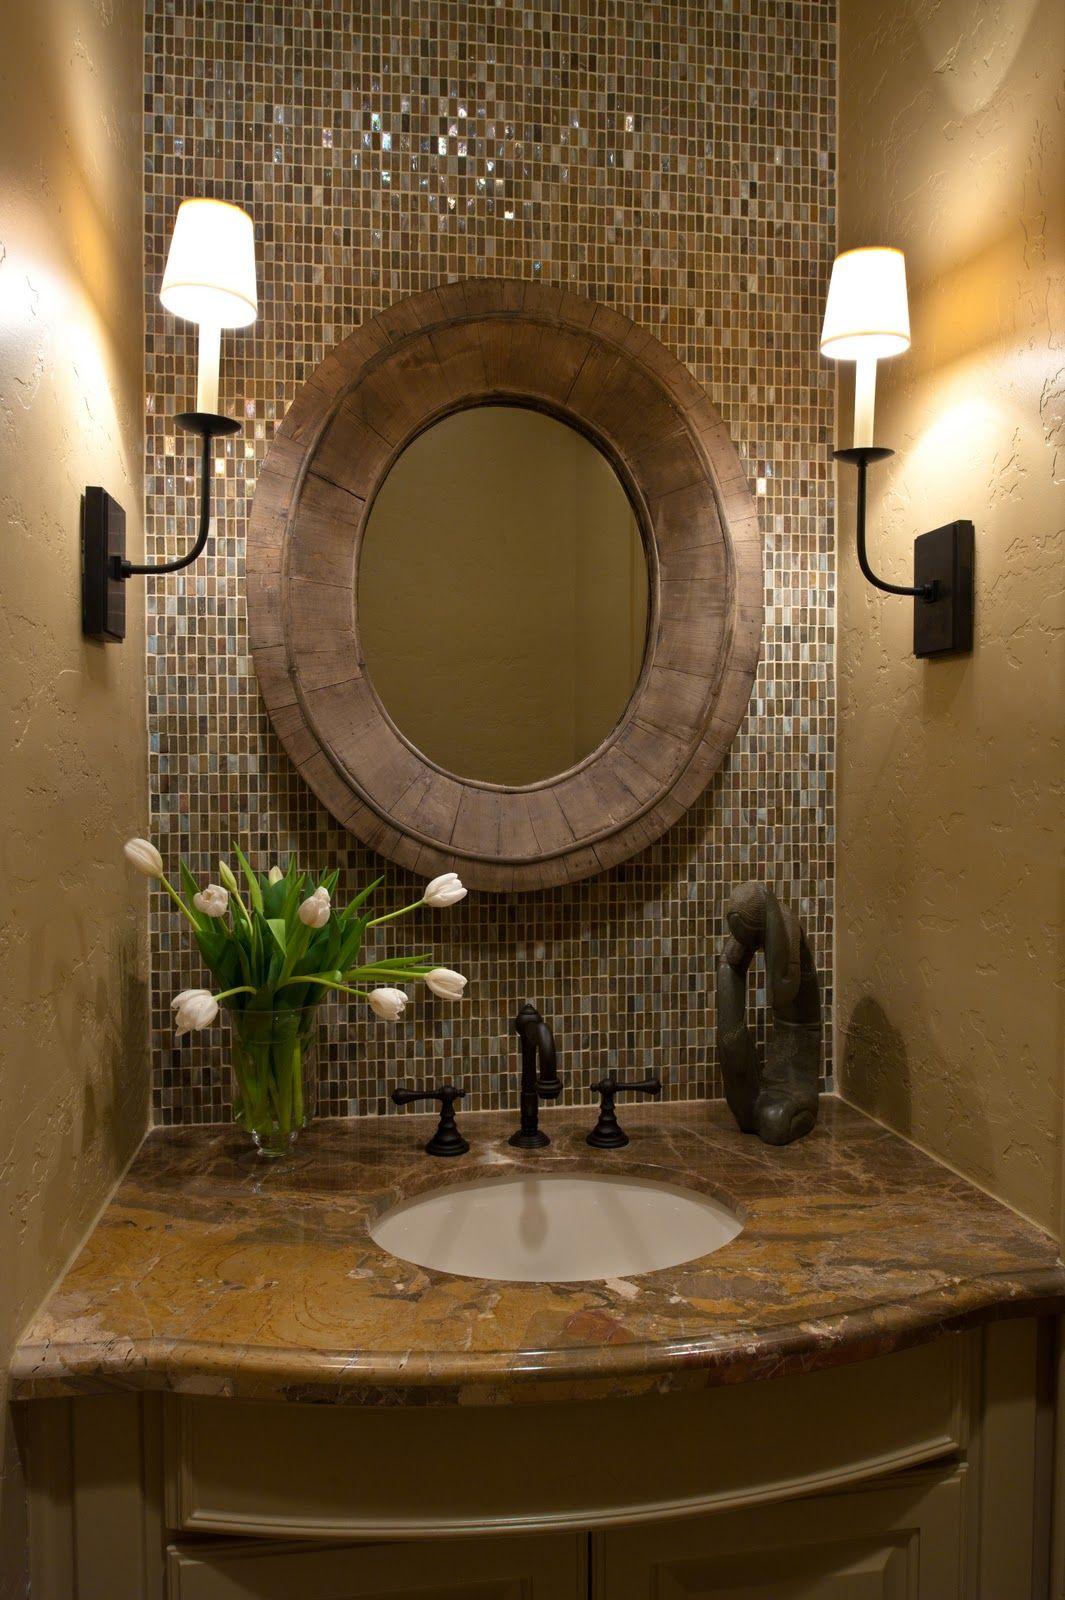 cool diy bathroom mirror inspiration-Best Of Diy Bathroom Mirror Image